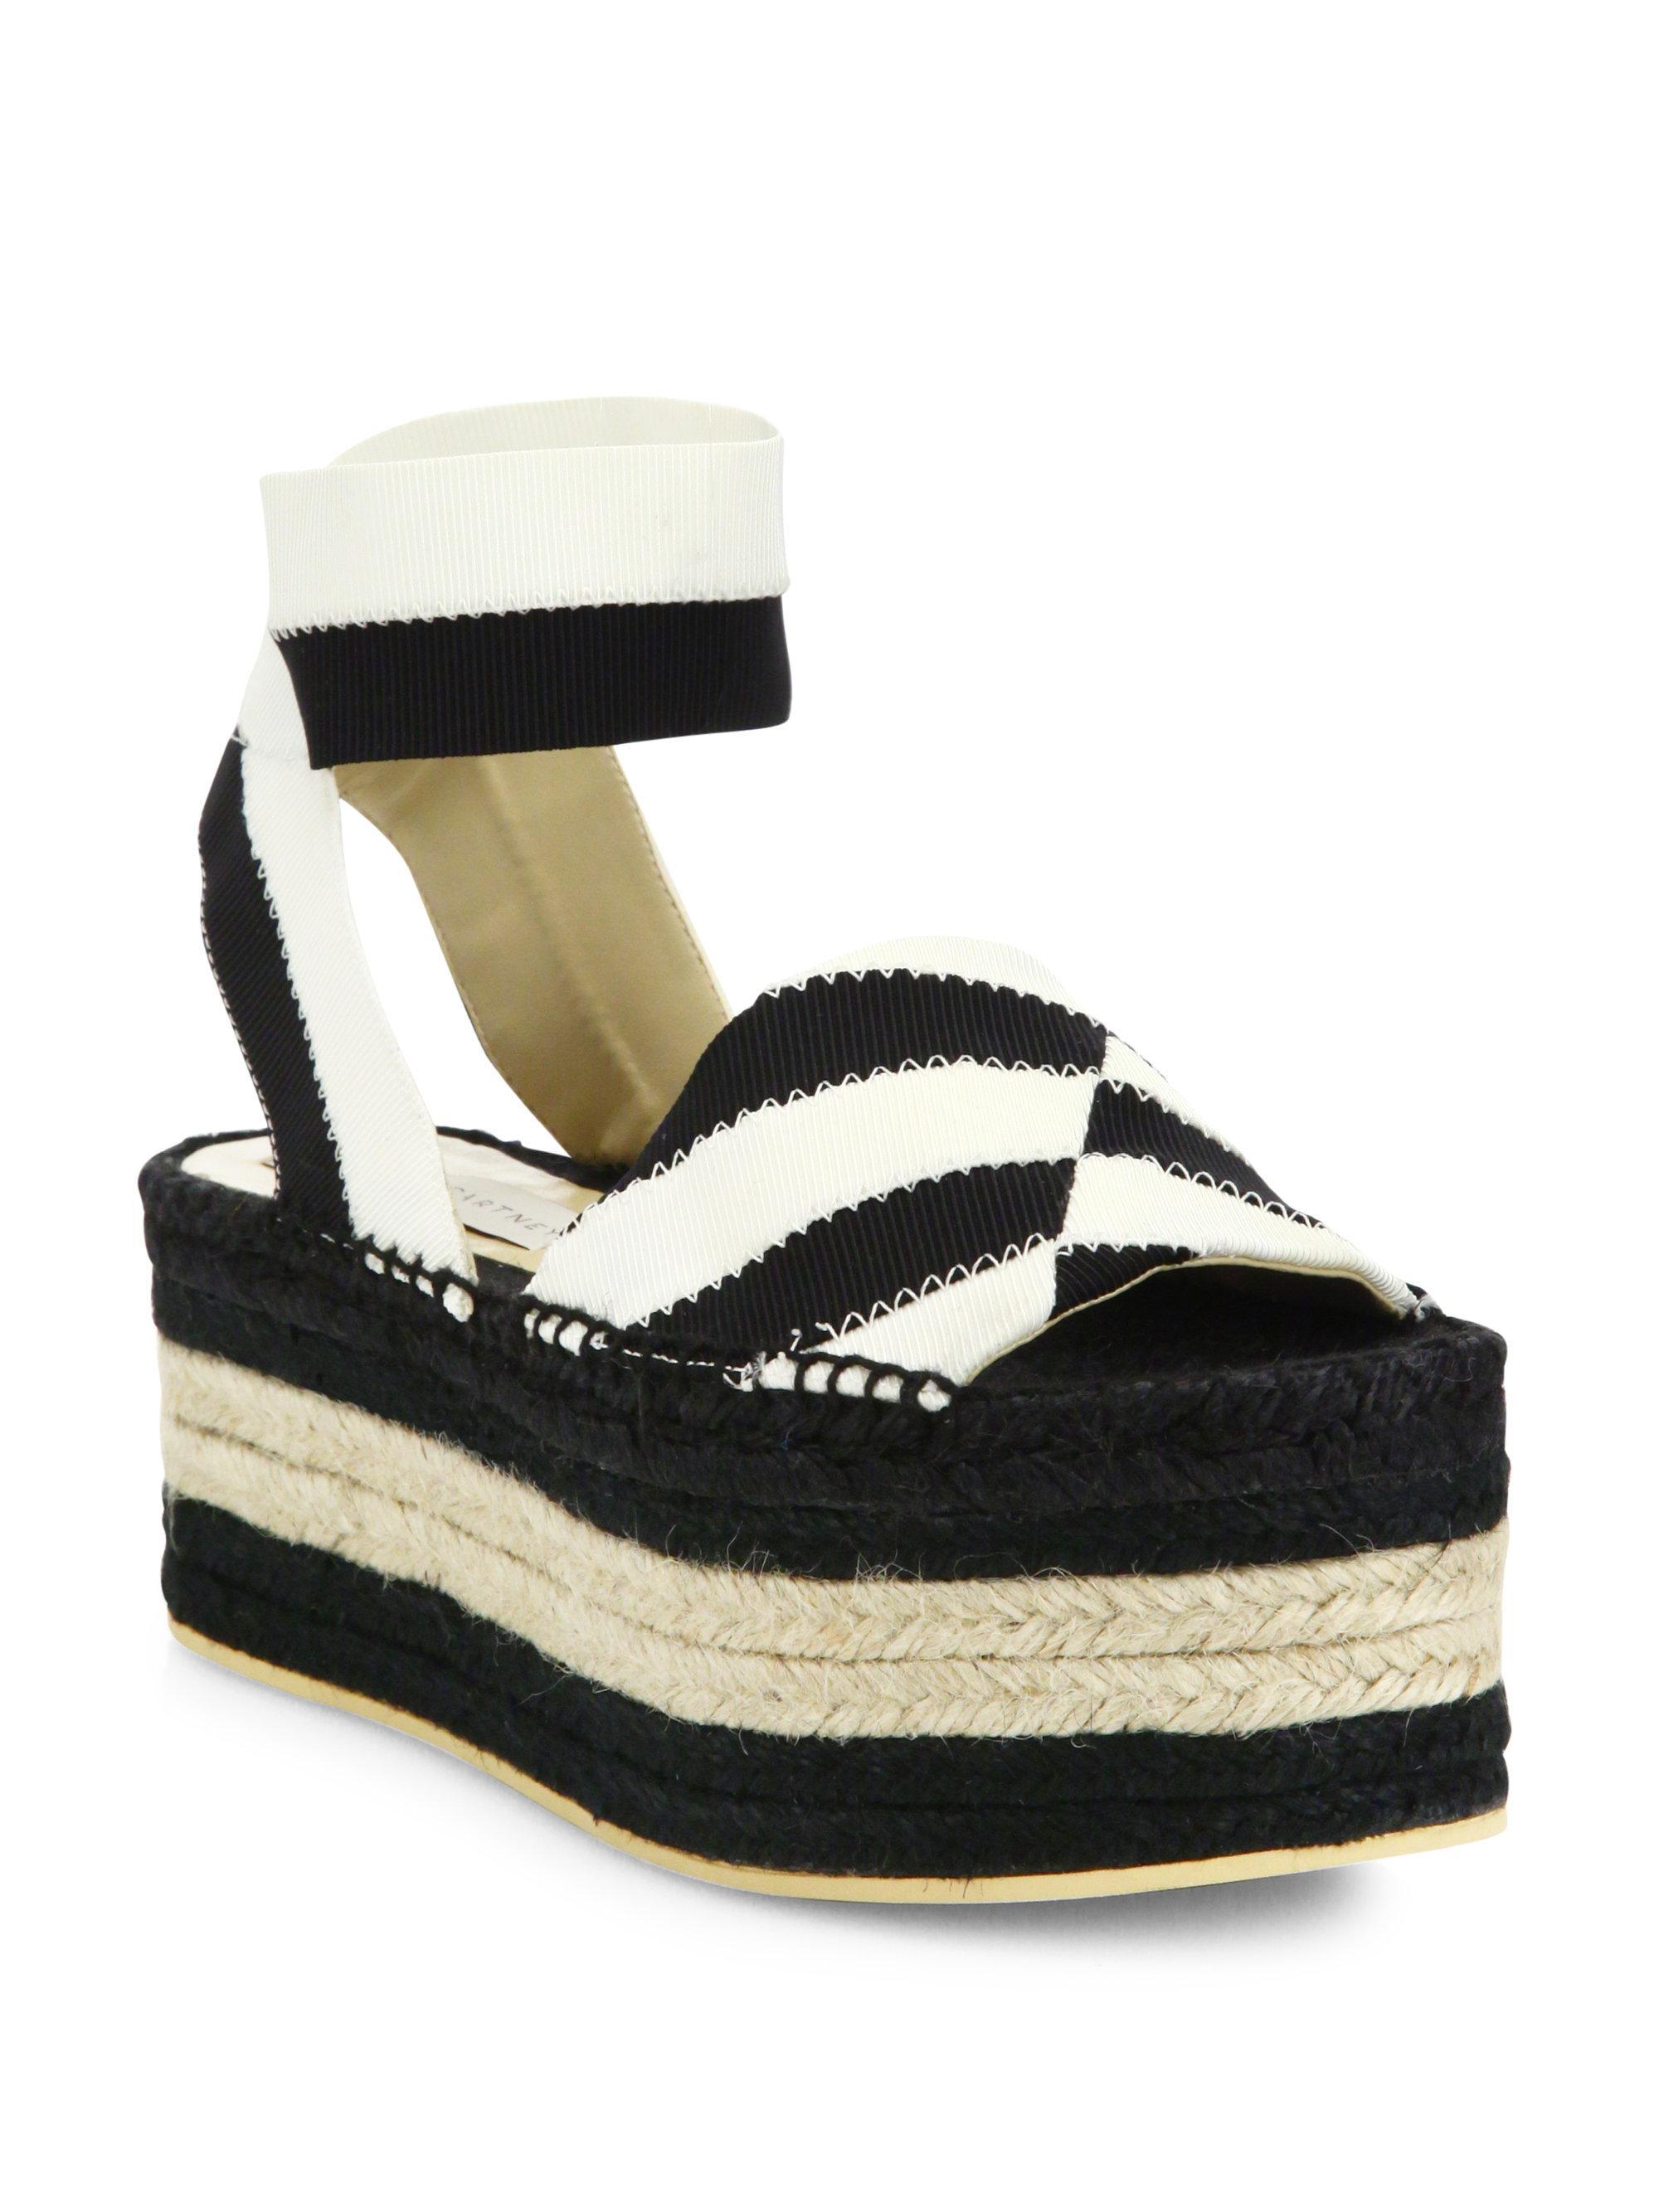 Sale Finishline Stella McCartney Striped espadrille platform sandals How Much Cheap Online Discount Good Selling Discount Cost 2GIFLjQBnv